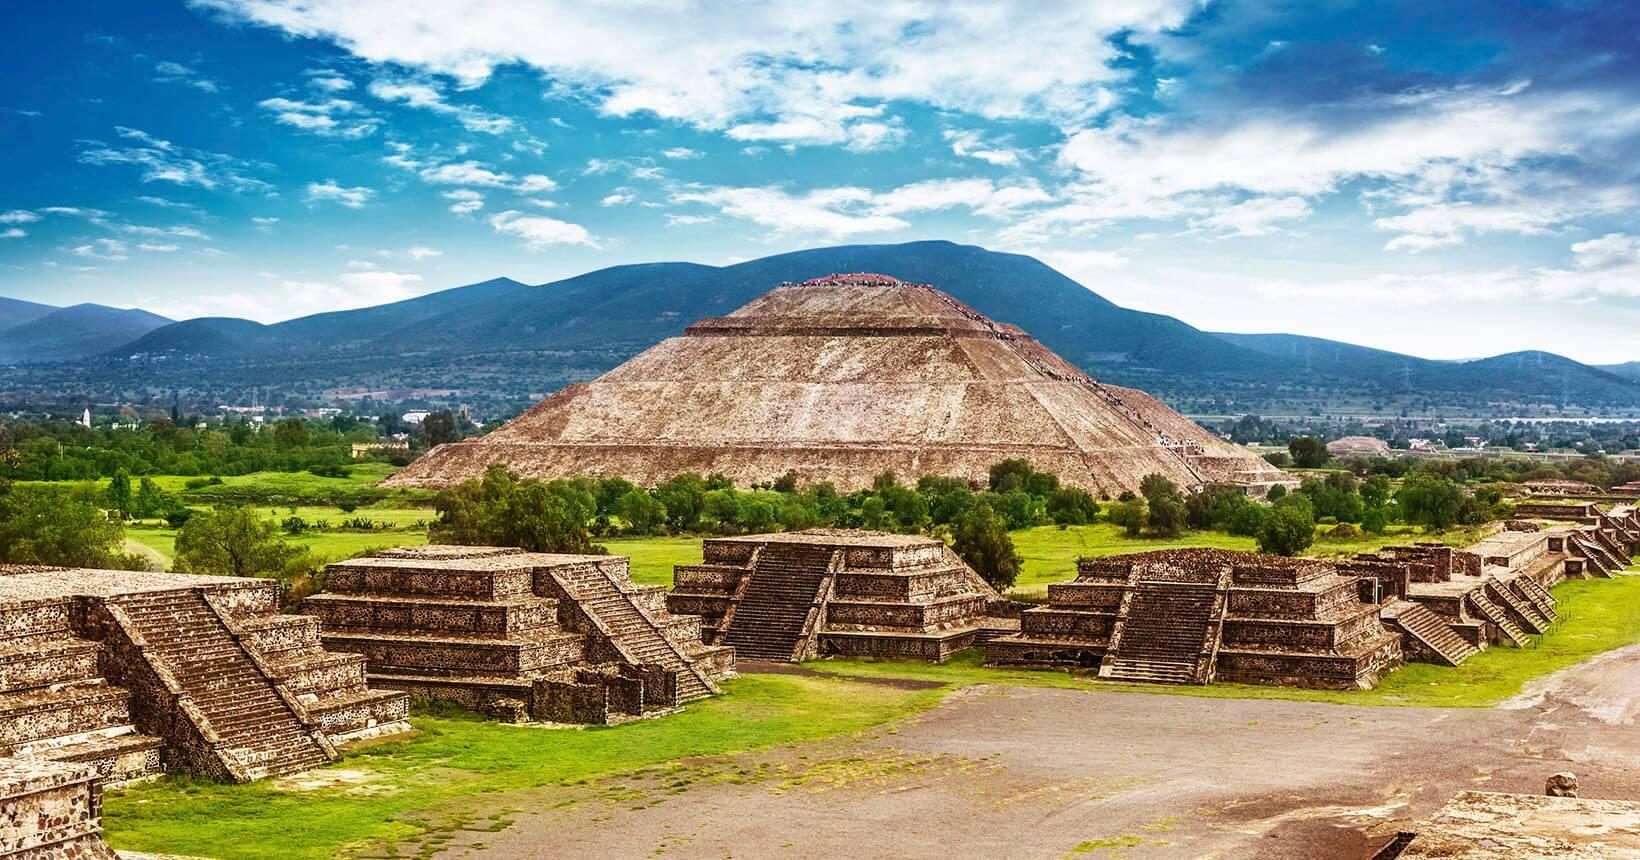 Viajar para o México é barato